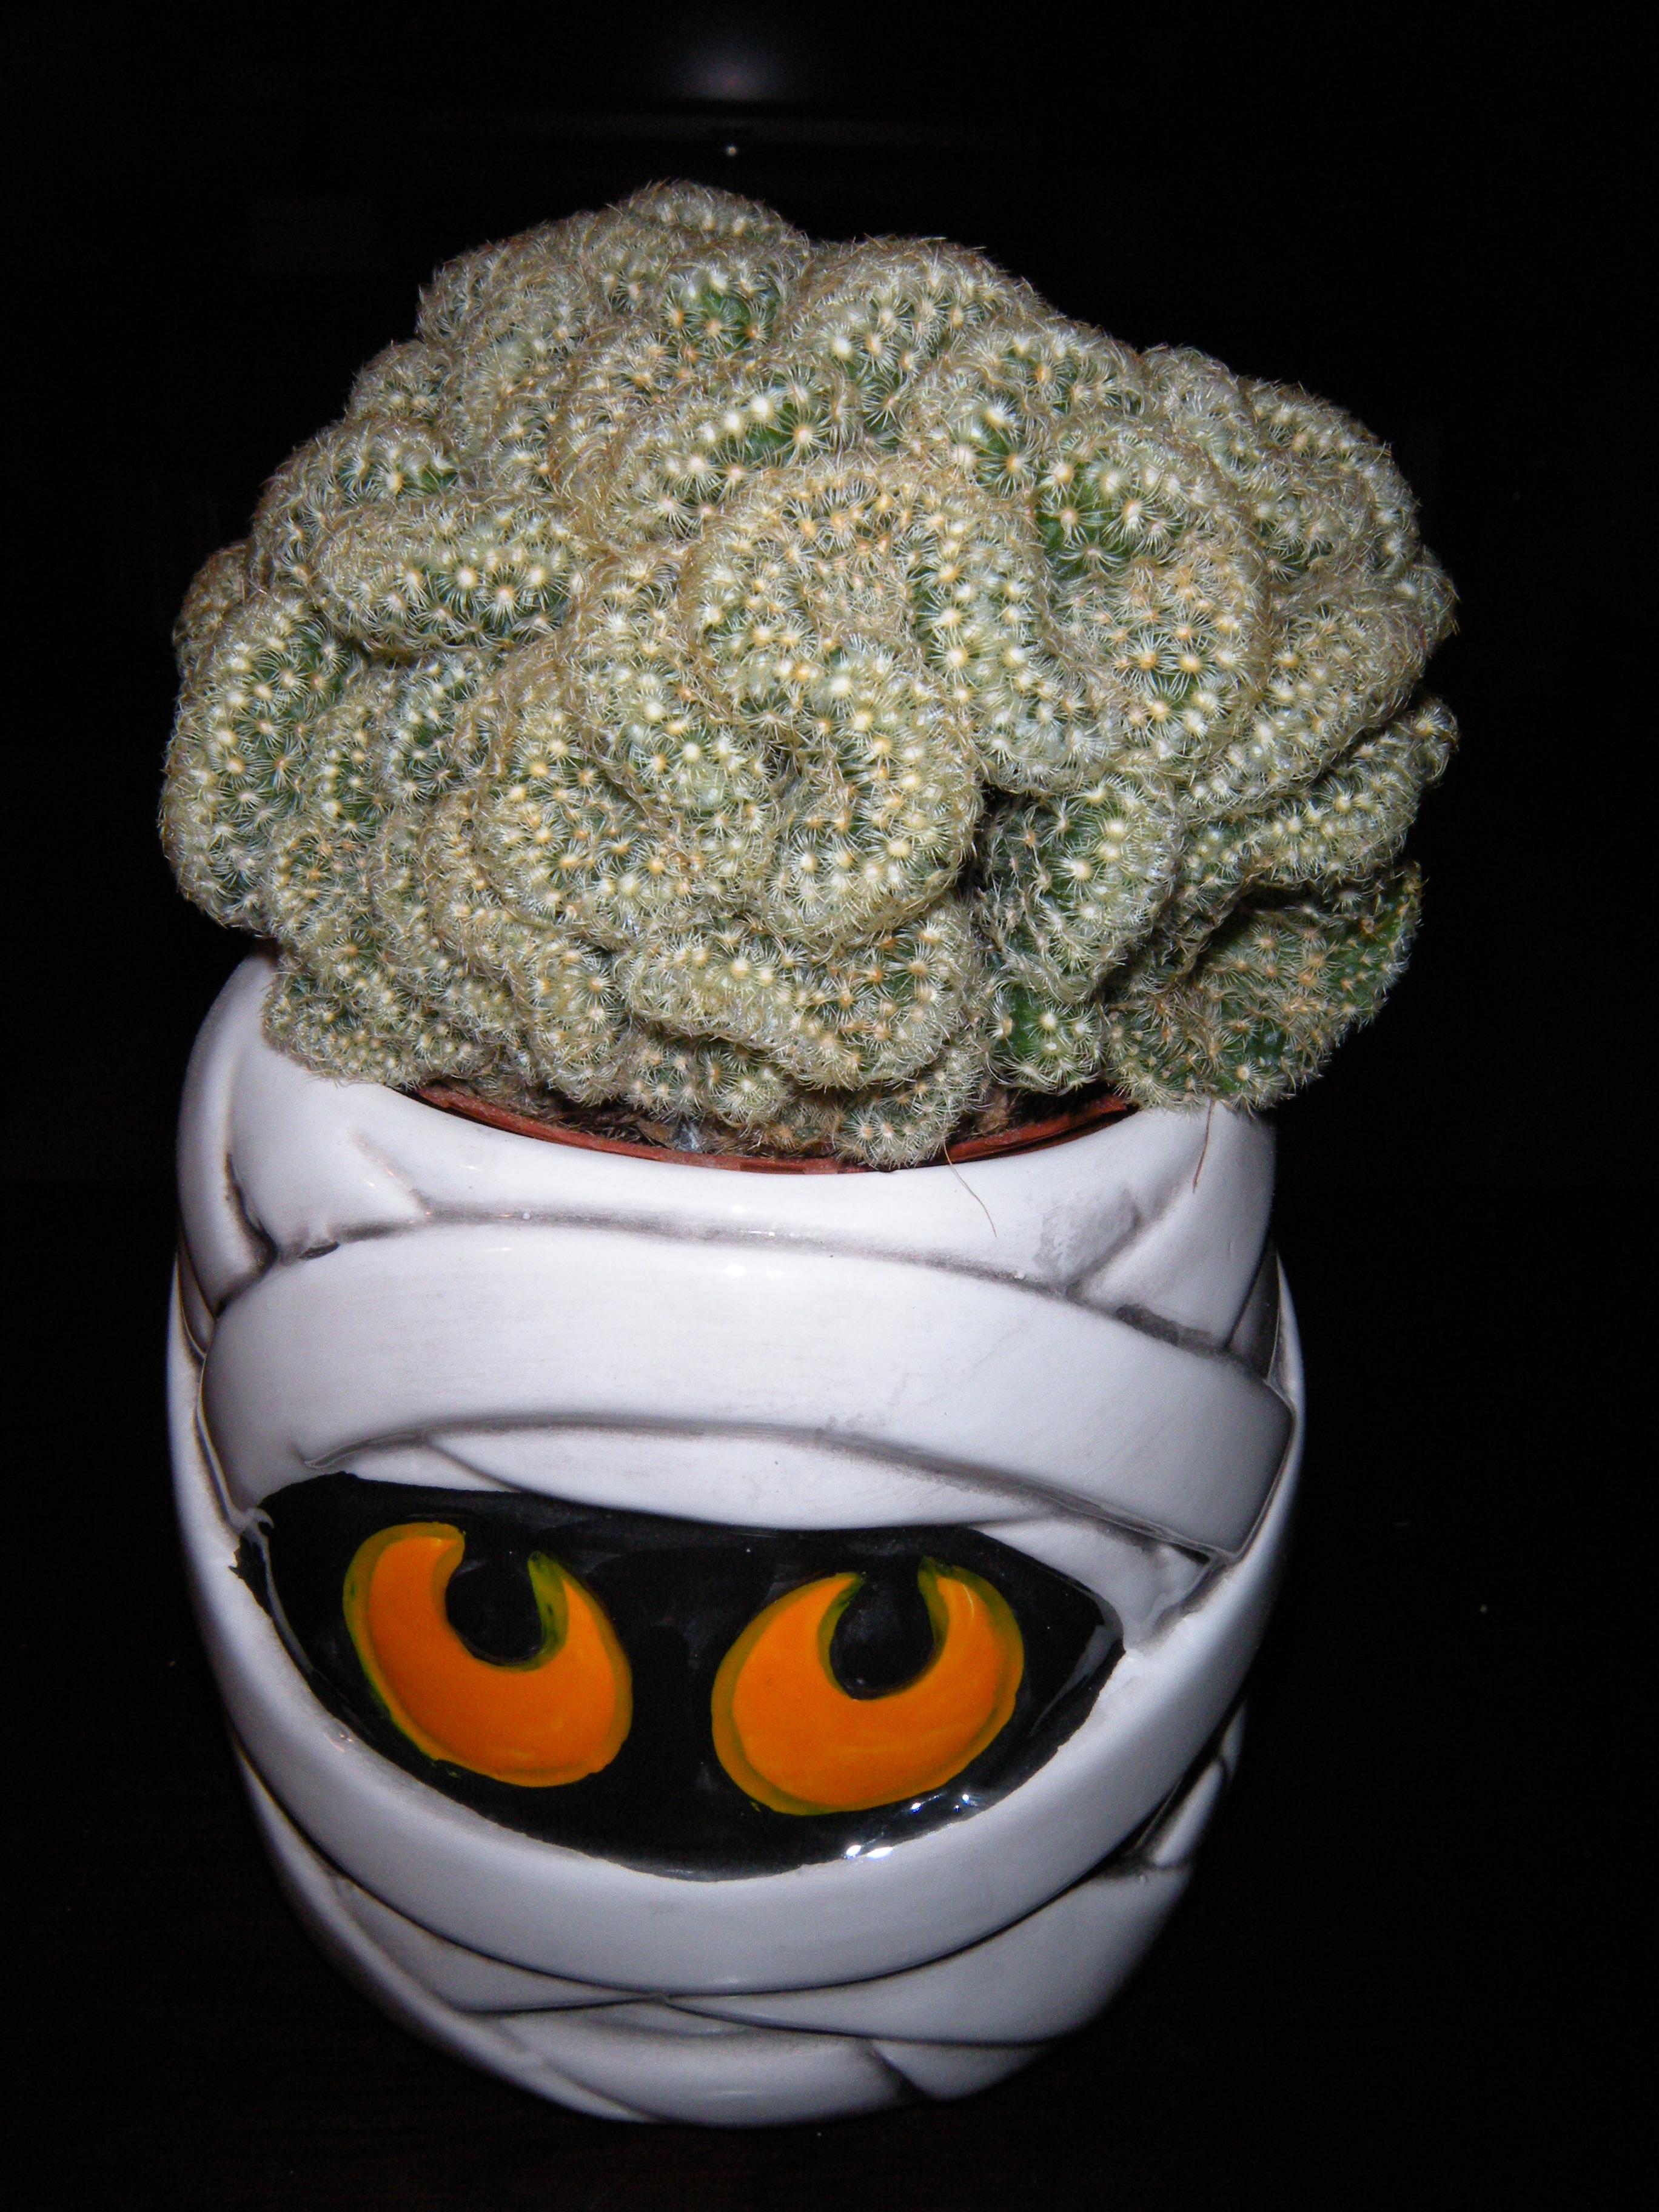 Halloween Brain Cactus photo JParadisi